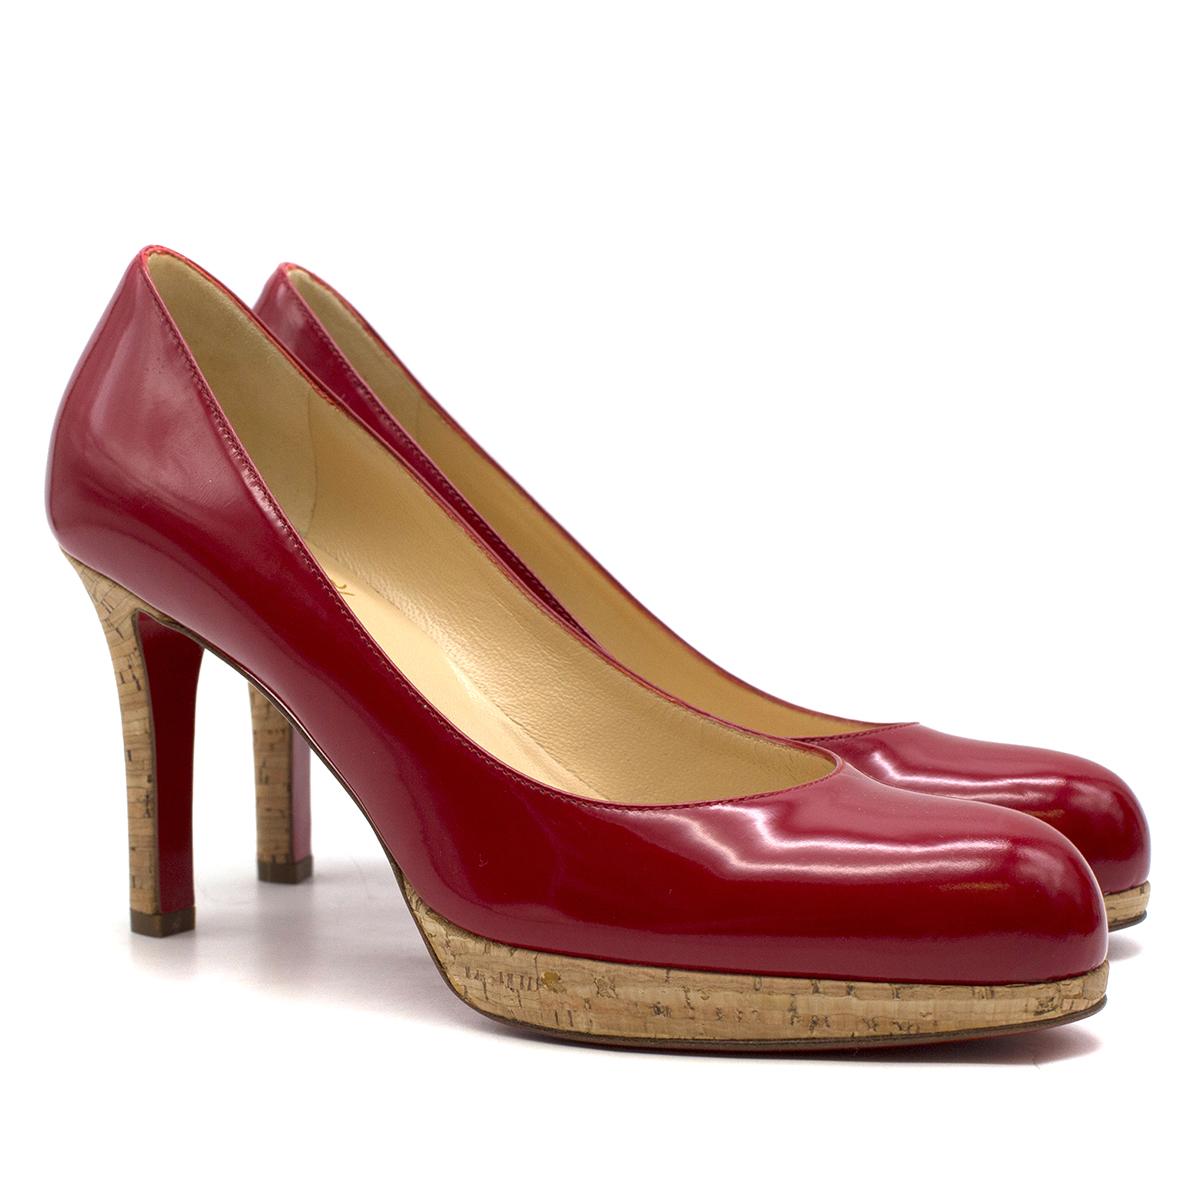 1c4496bdbda Christian Louboutin Red Patent Leather platform pumps